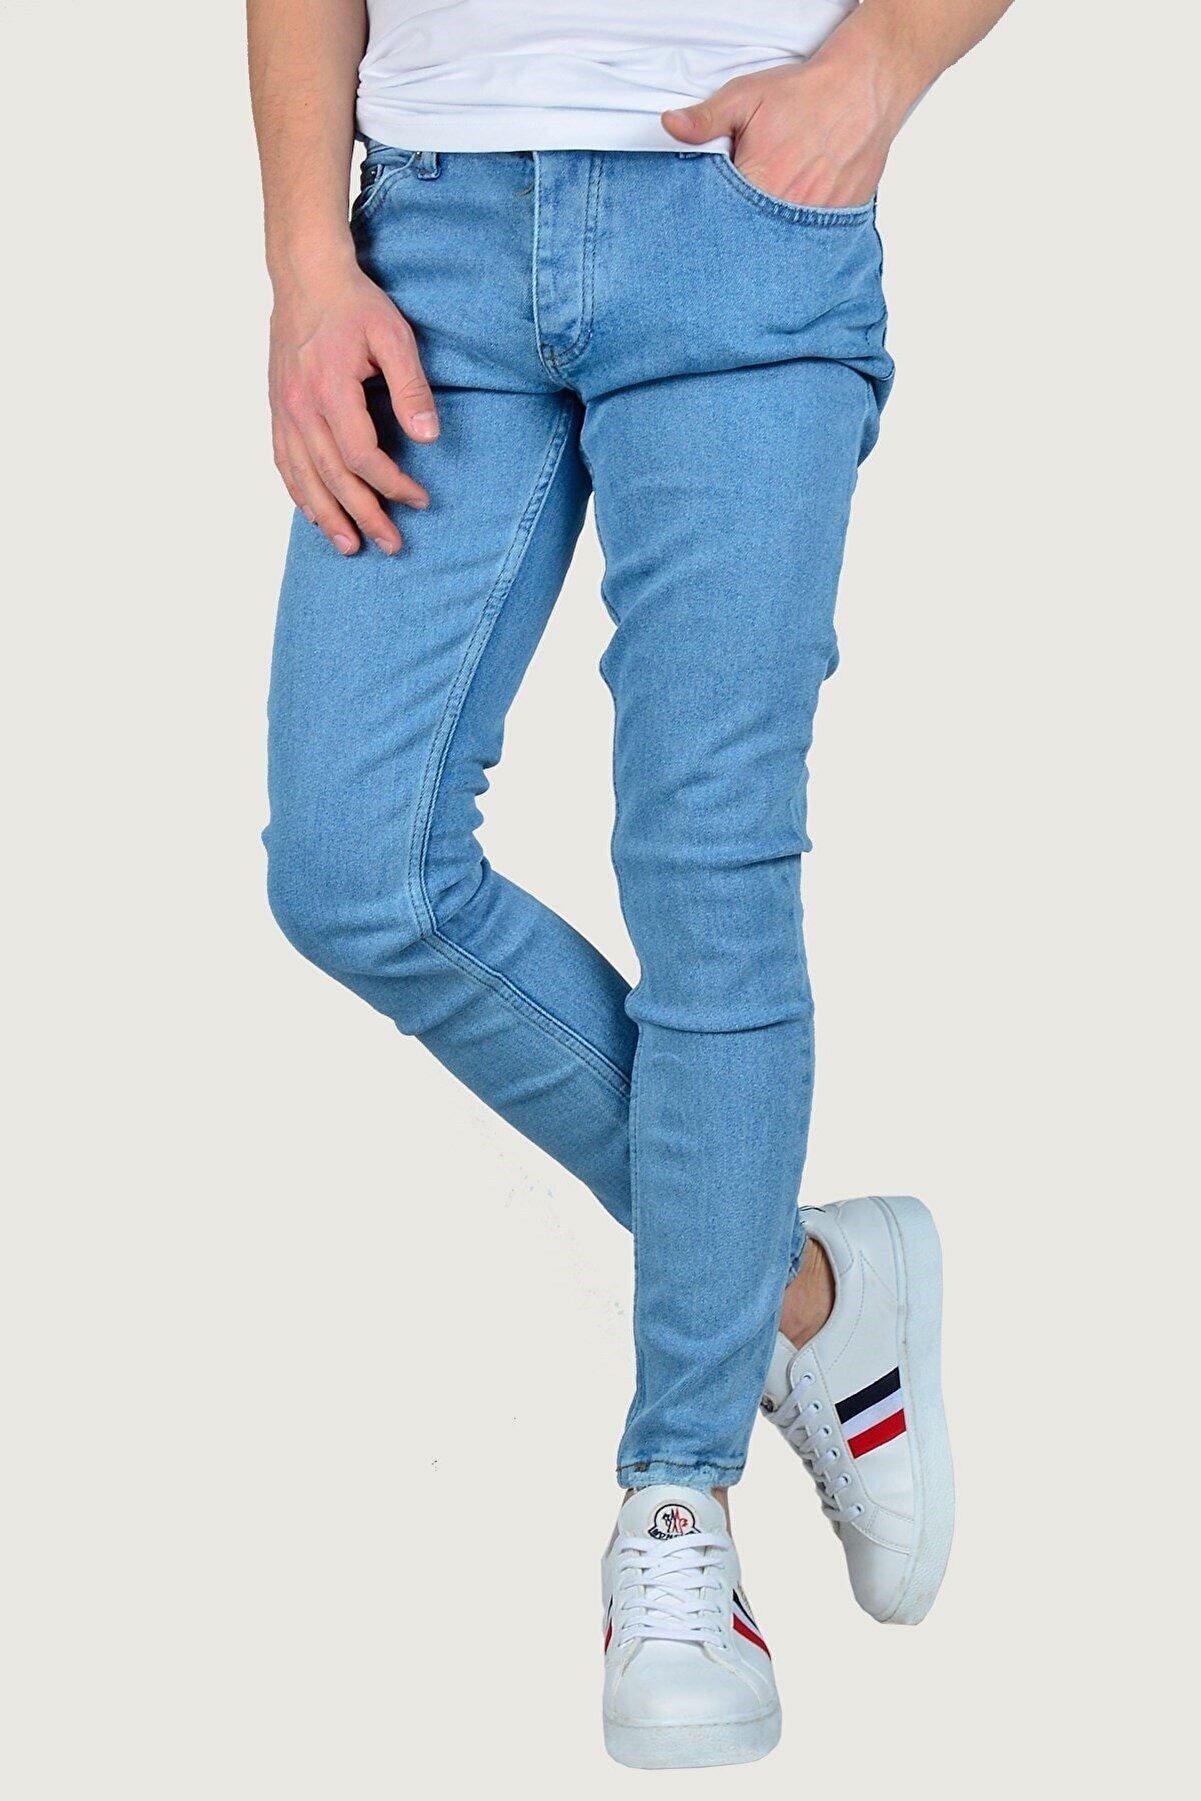 Terapi Men Erkek Kot Pantolon 9K-2100317-008 Buz Mavisi